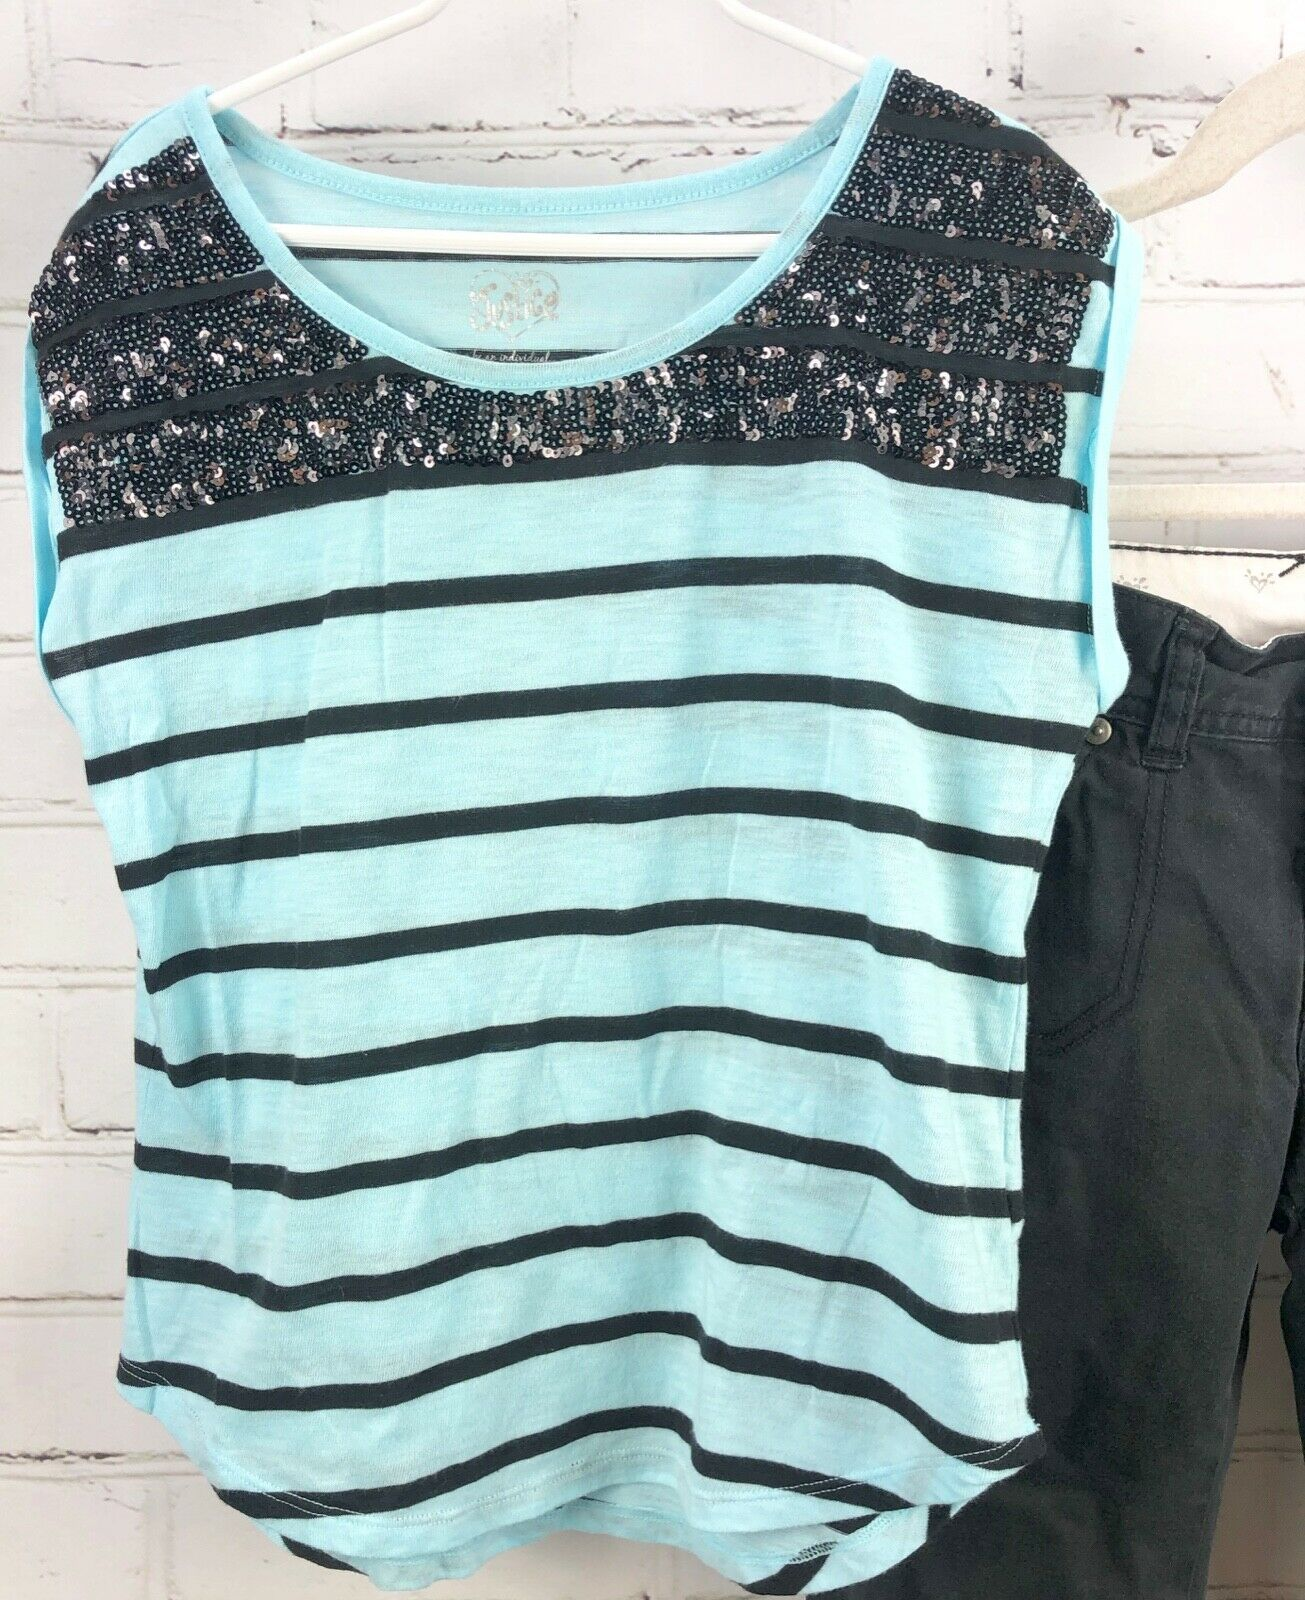 JUSTICE Beaded Stripe Top + Black Capri Pants Girls Size 12 Outfit Set image 2